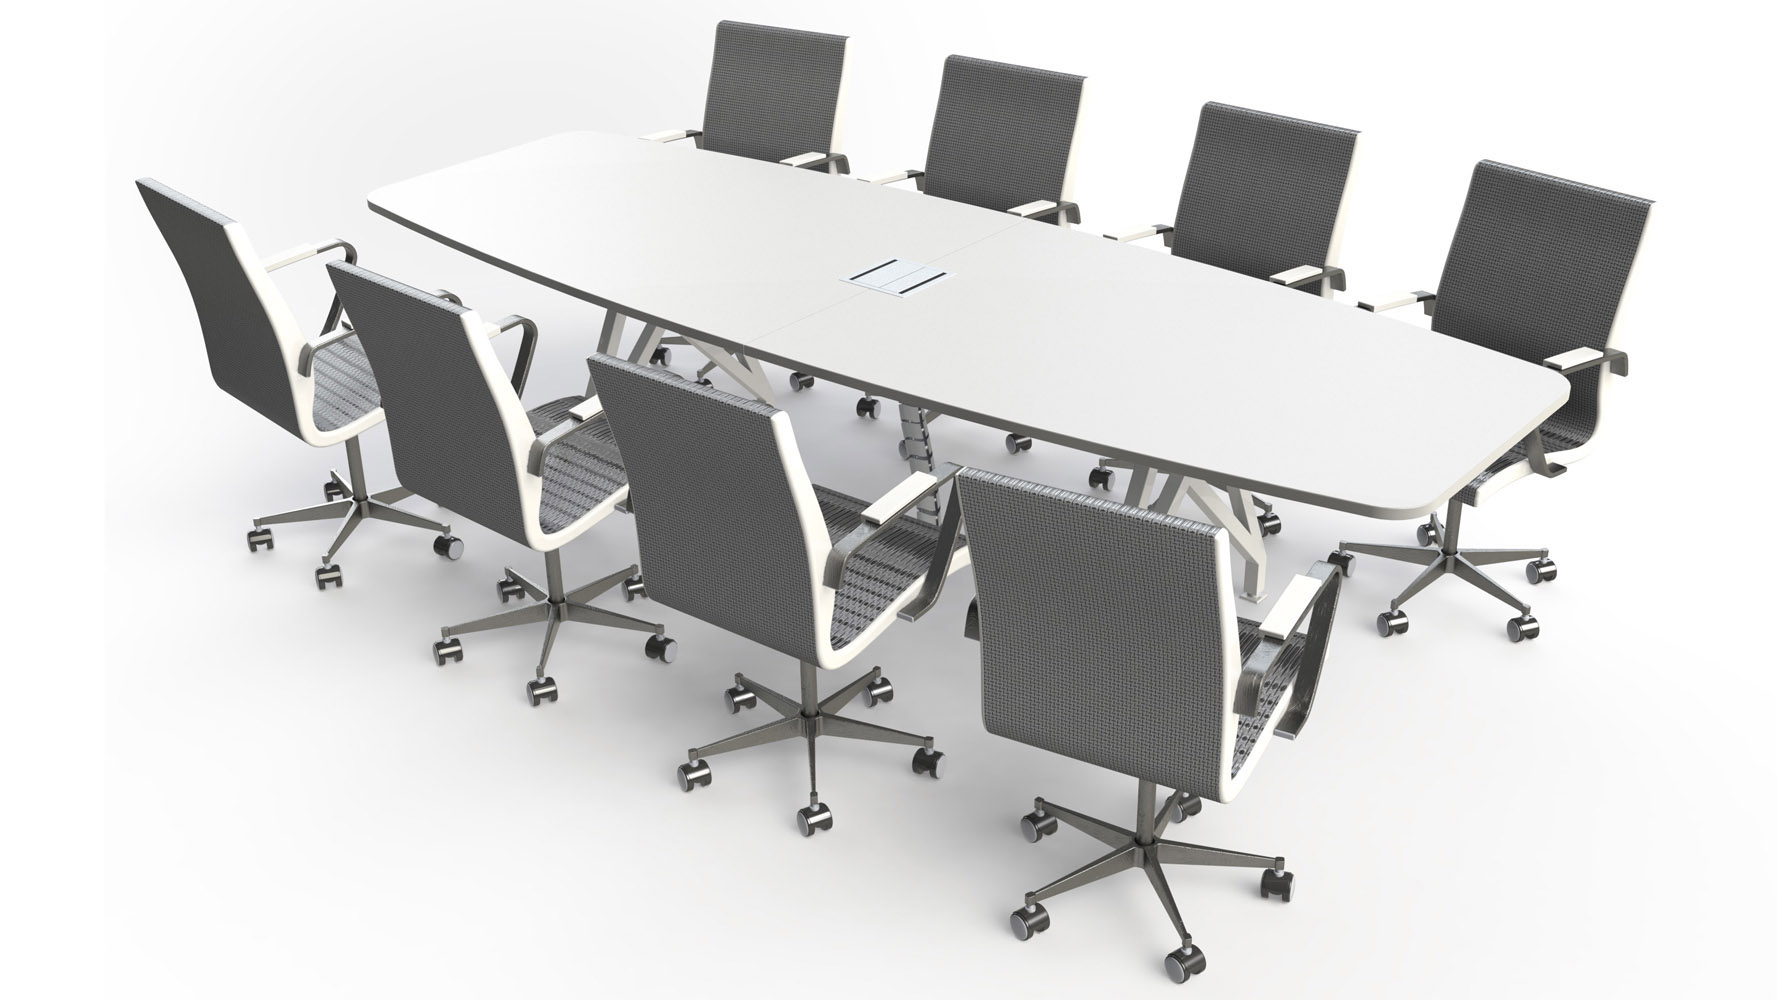 KAYAK Conference Table Zuri Furniture - Black conference room table